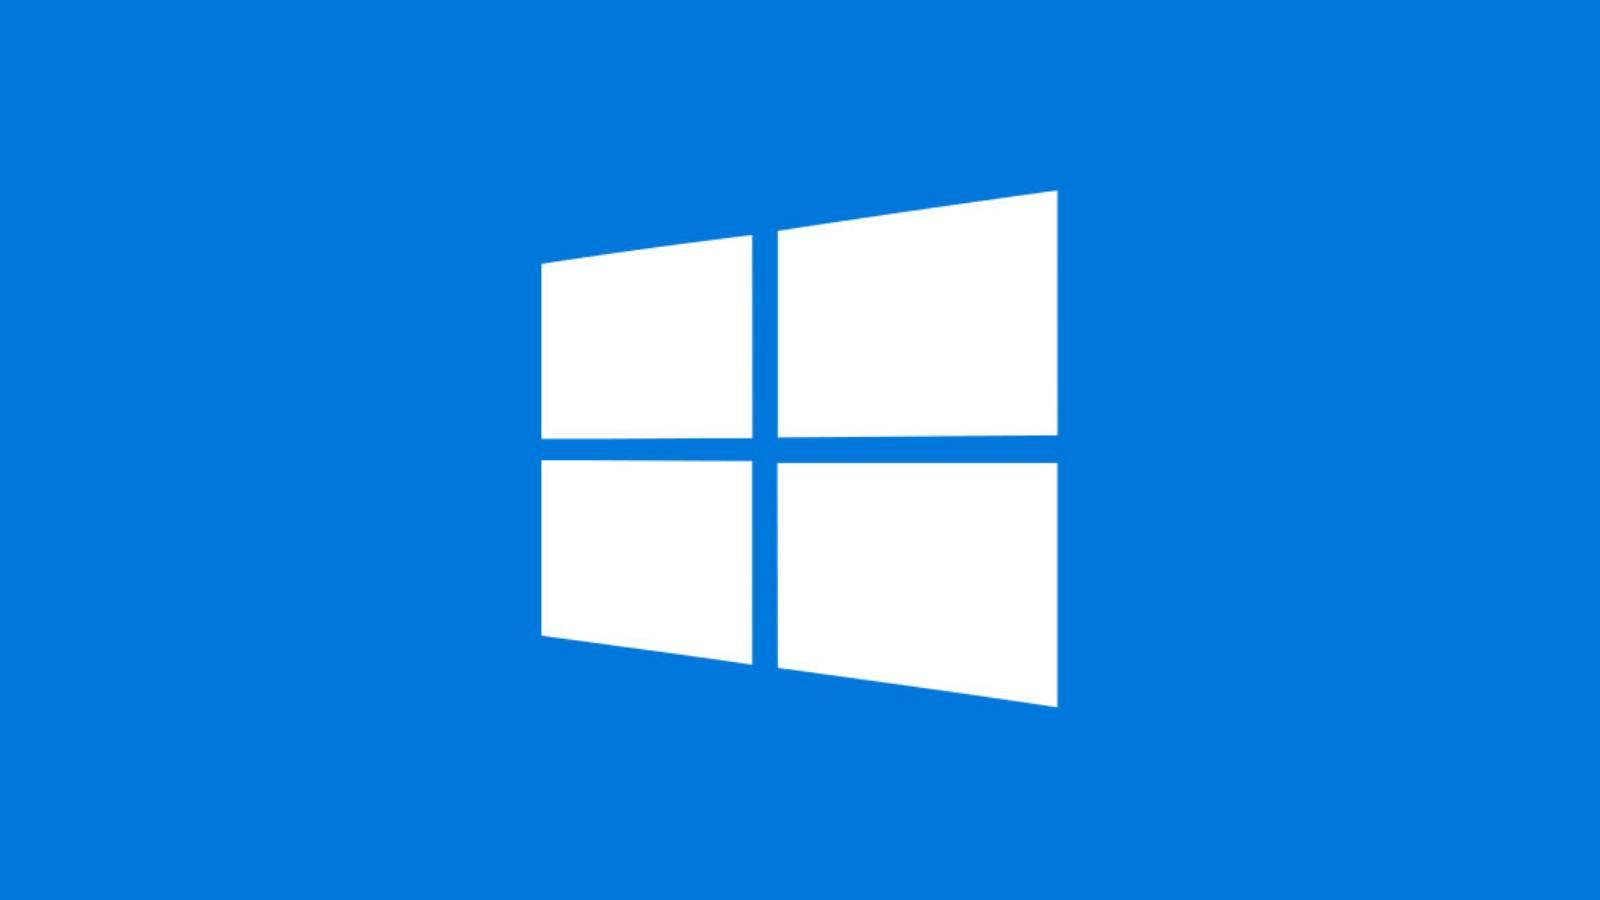 Windows 10 frame